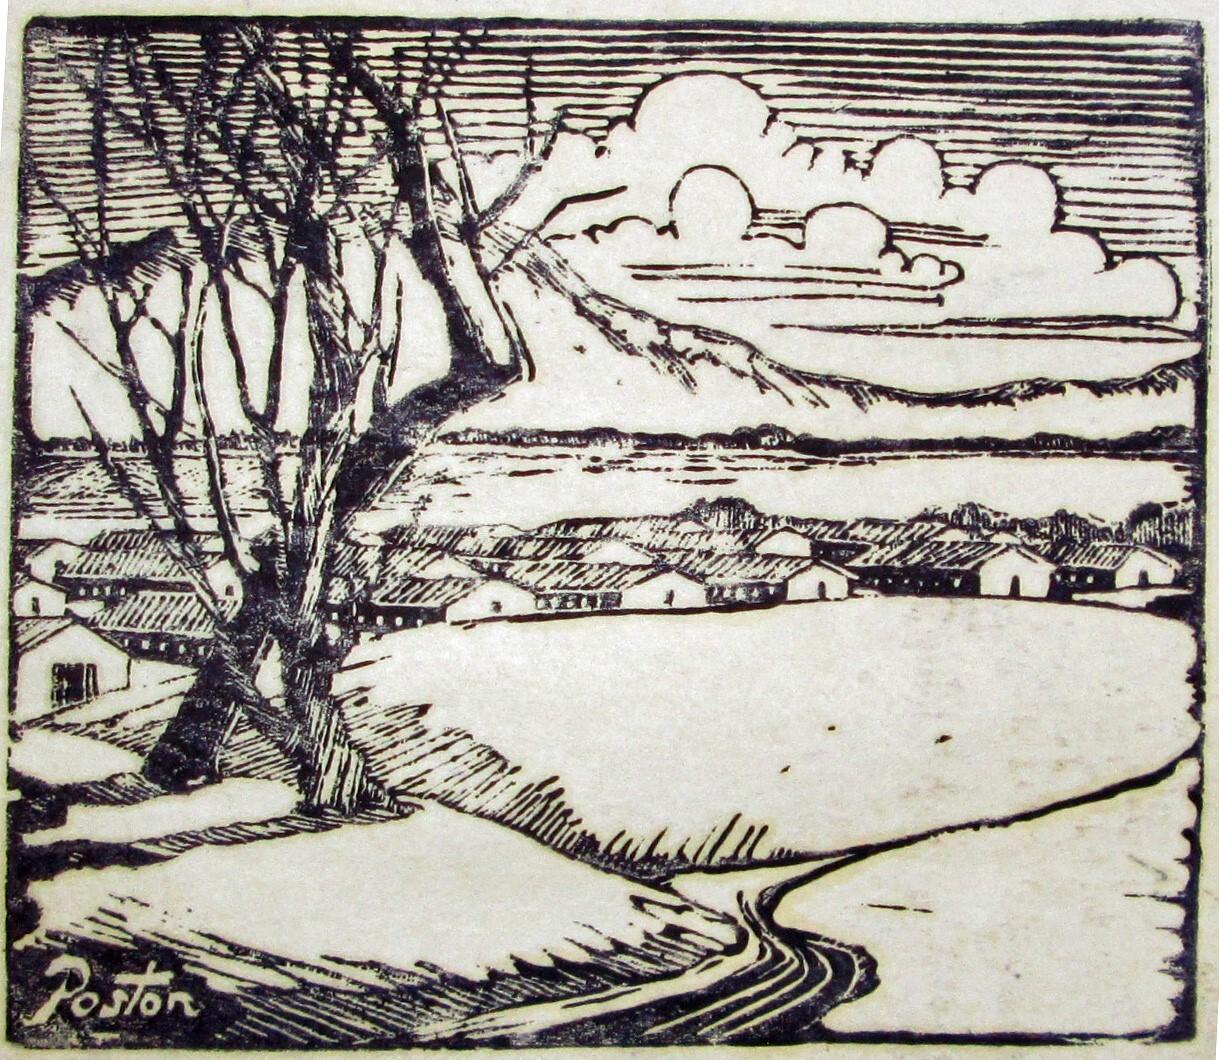 Block print of Poston Village   Courtesy of Bill Bell